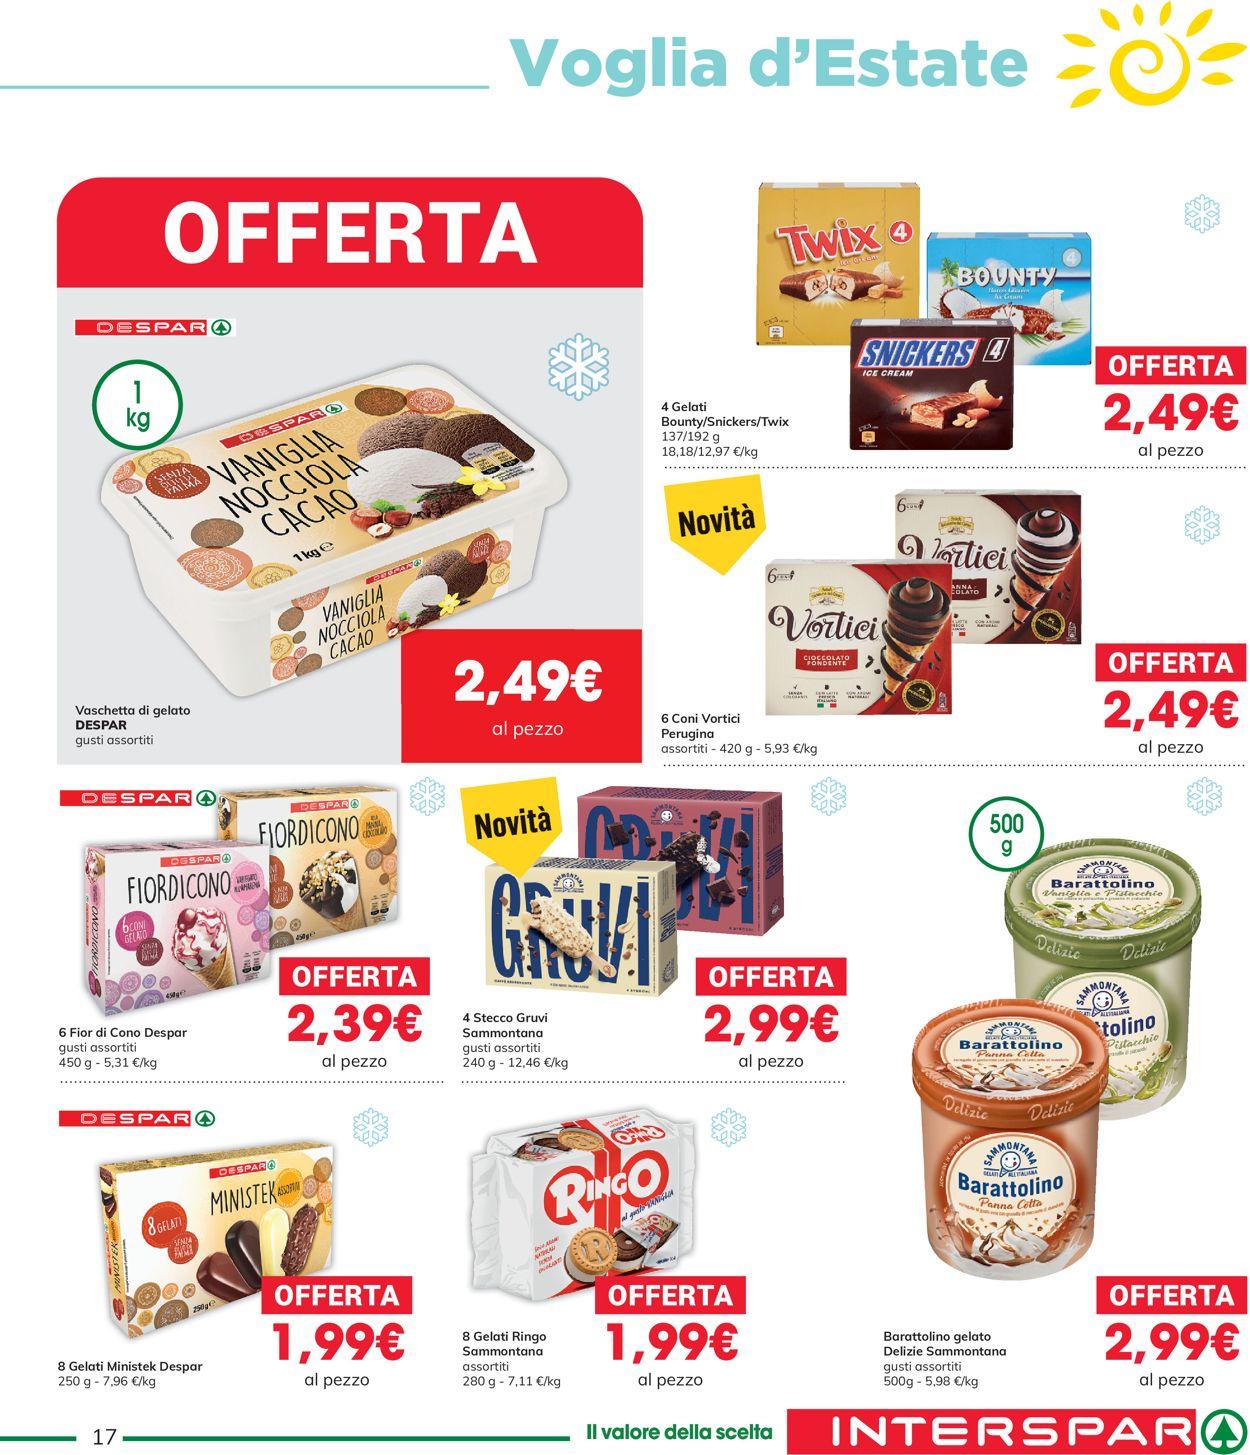 Volantino Interspar - Offerte 27/05-09/06/2021 (Pagina 17)